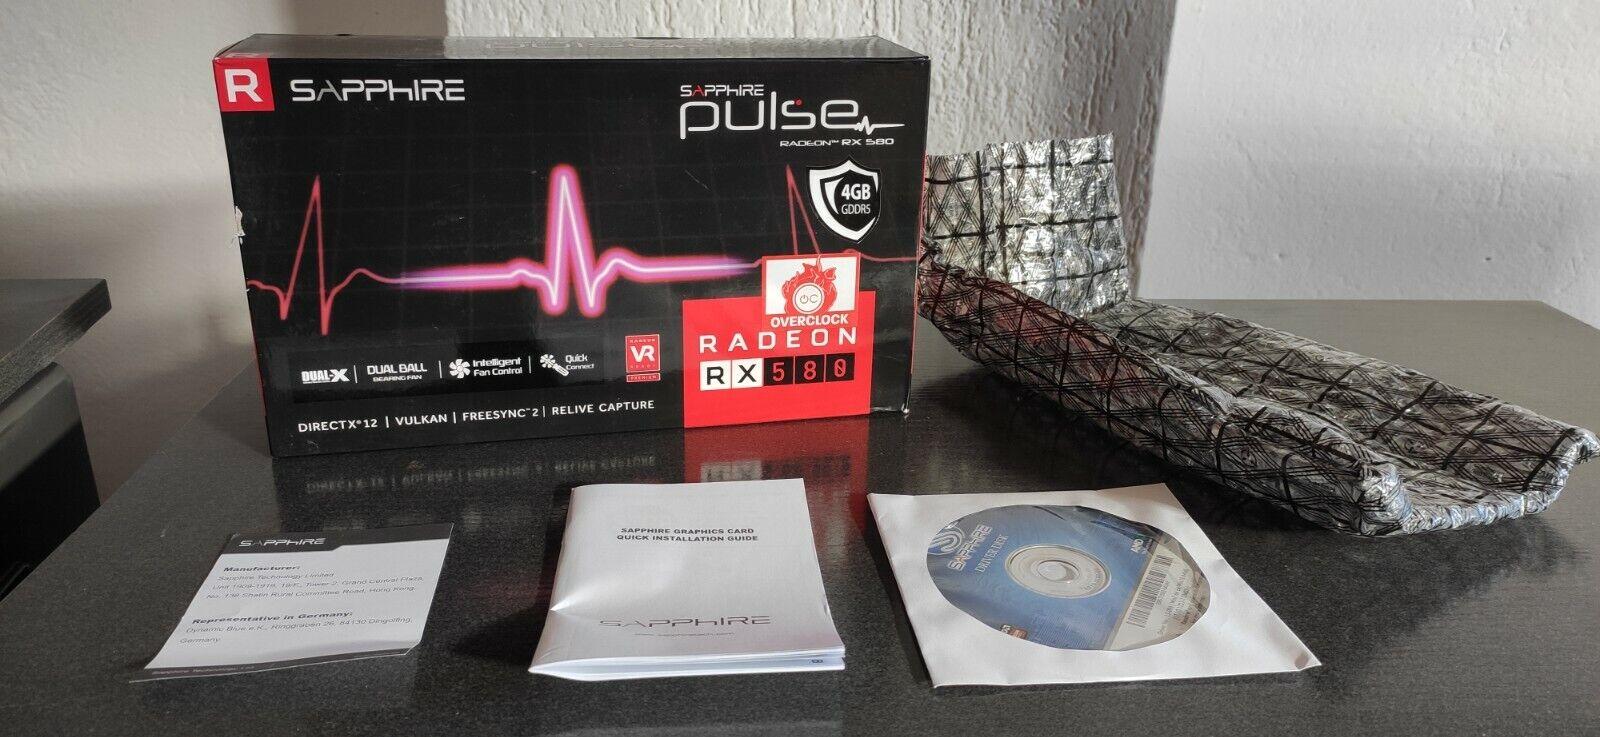 * Box Only * AMD Sapphire Pulse Radeon rx580 OC 4gb Graphics Card Box/NO GPU